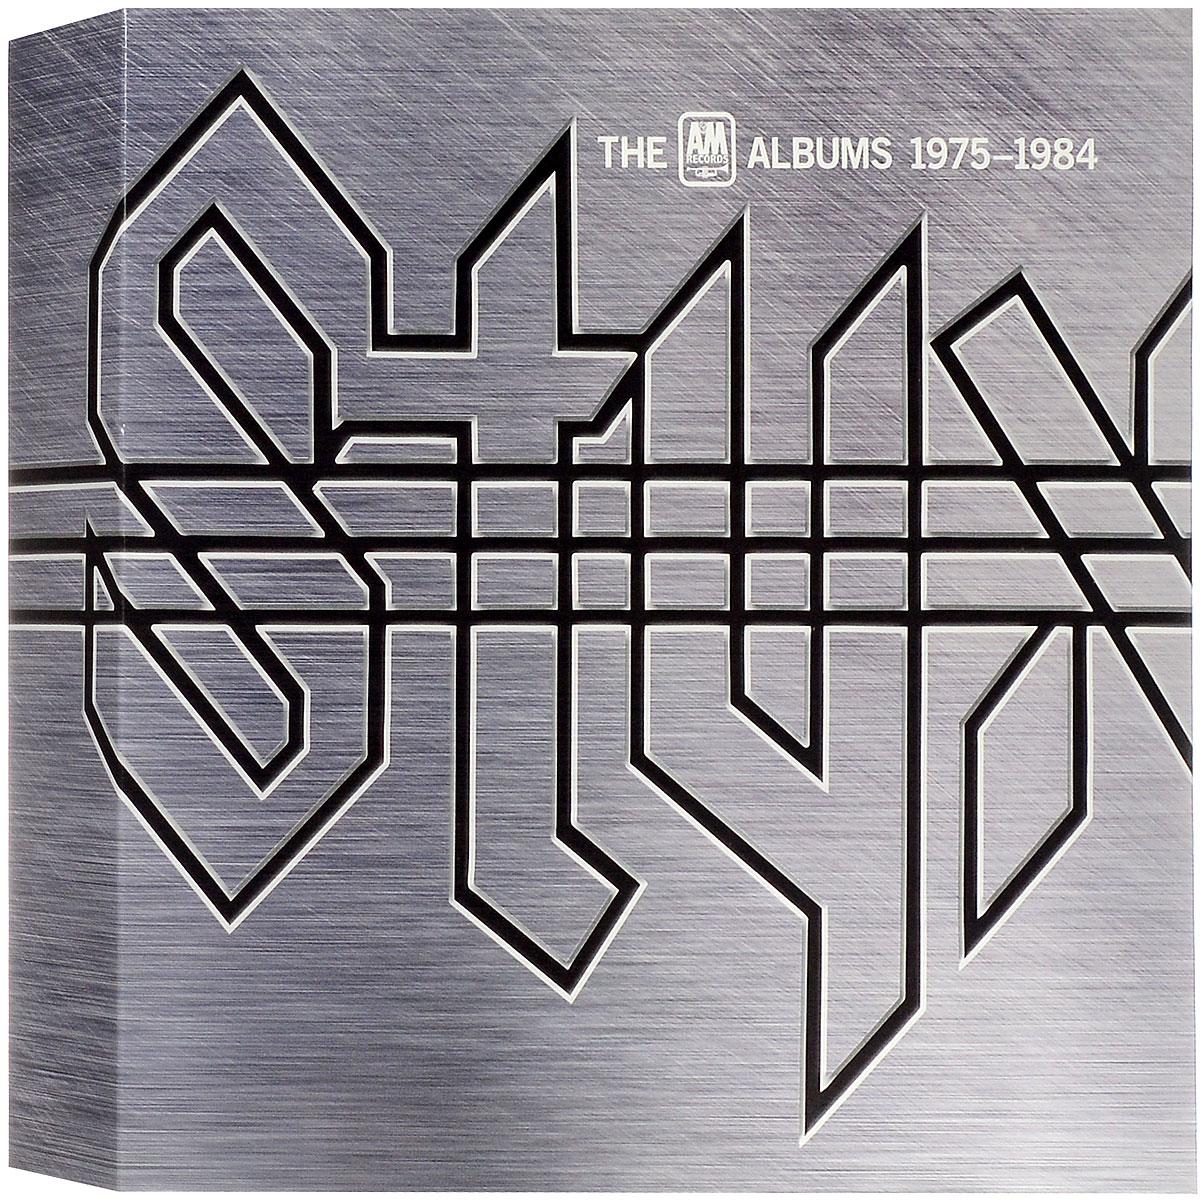 Styx Styx. The A&M Years 1975-1984 (LP)